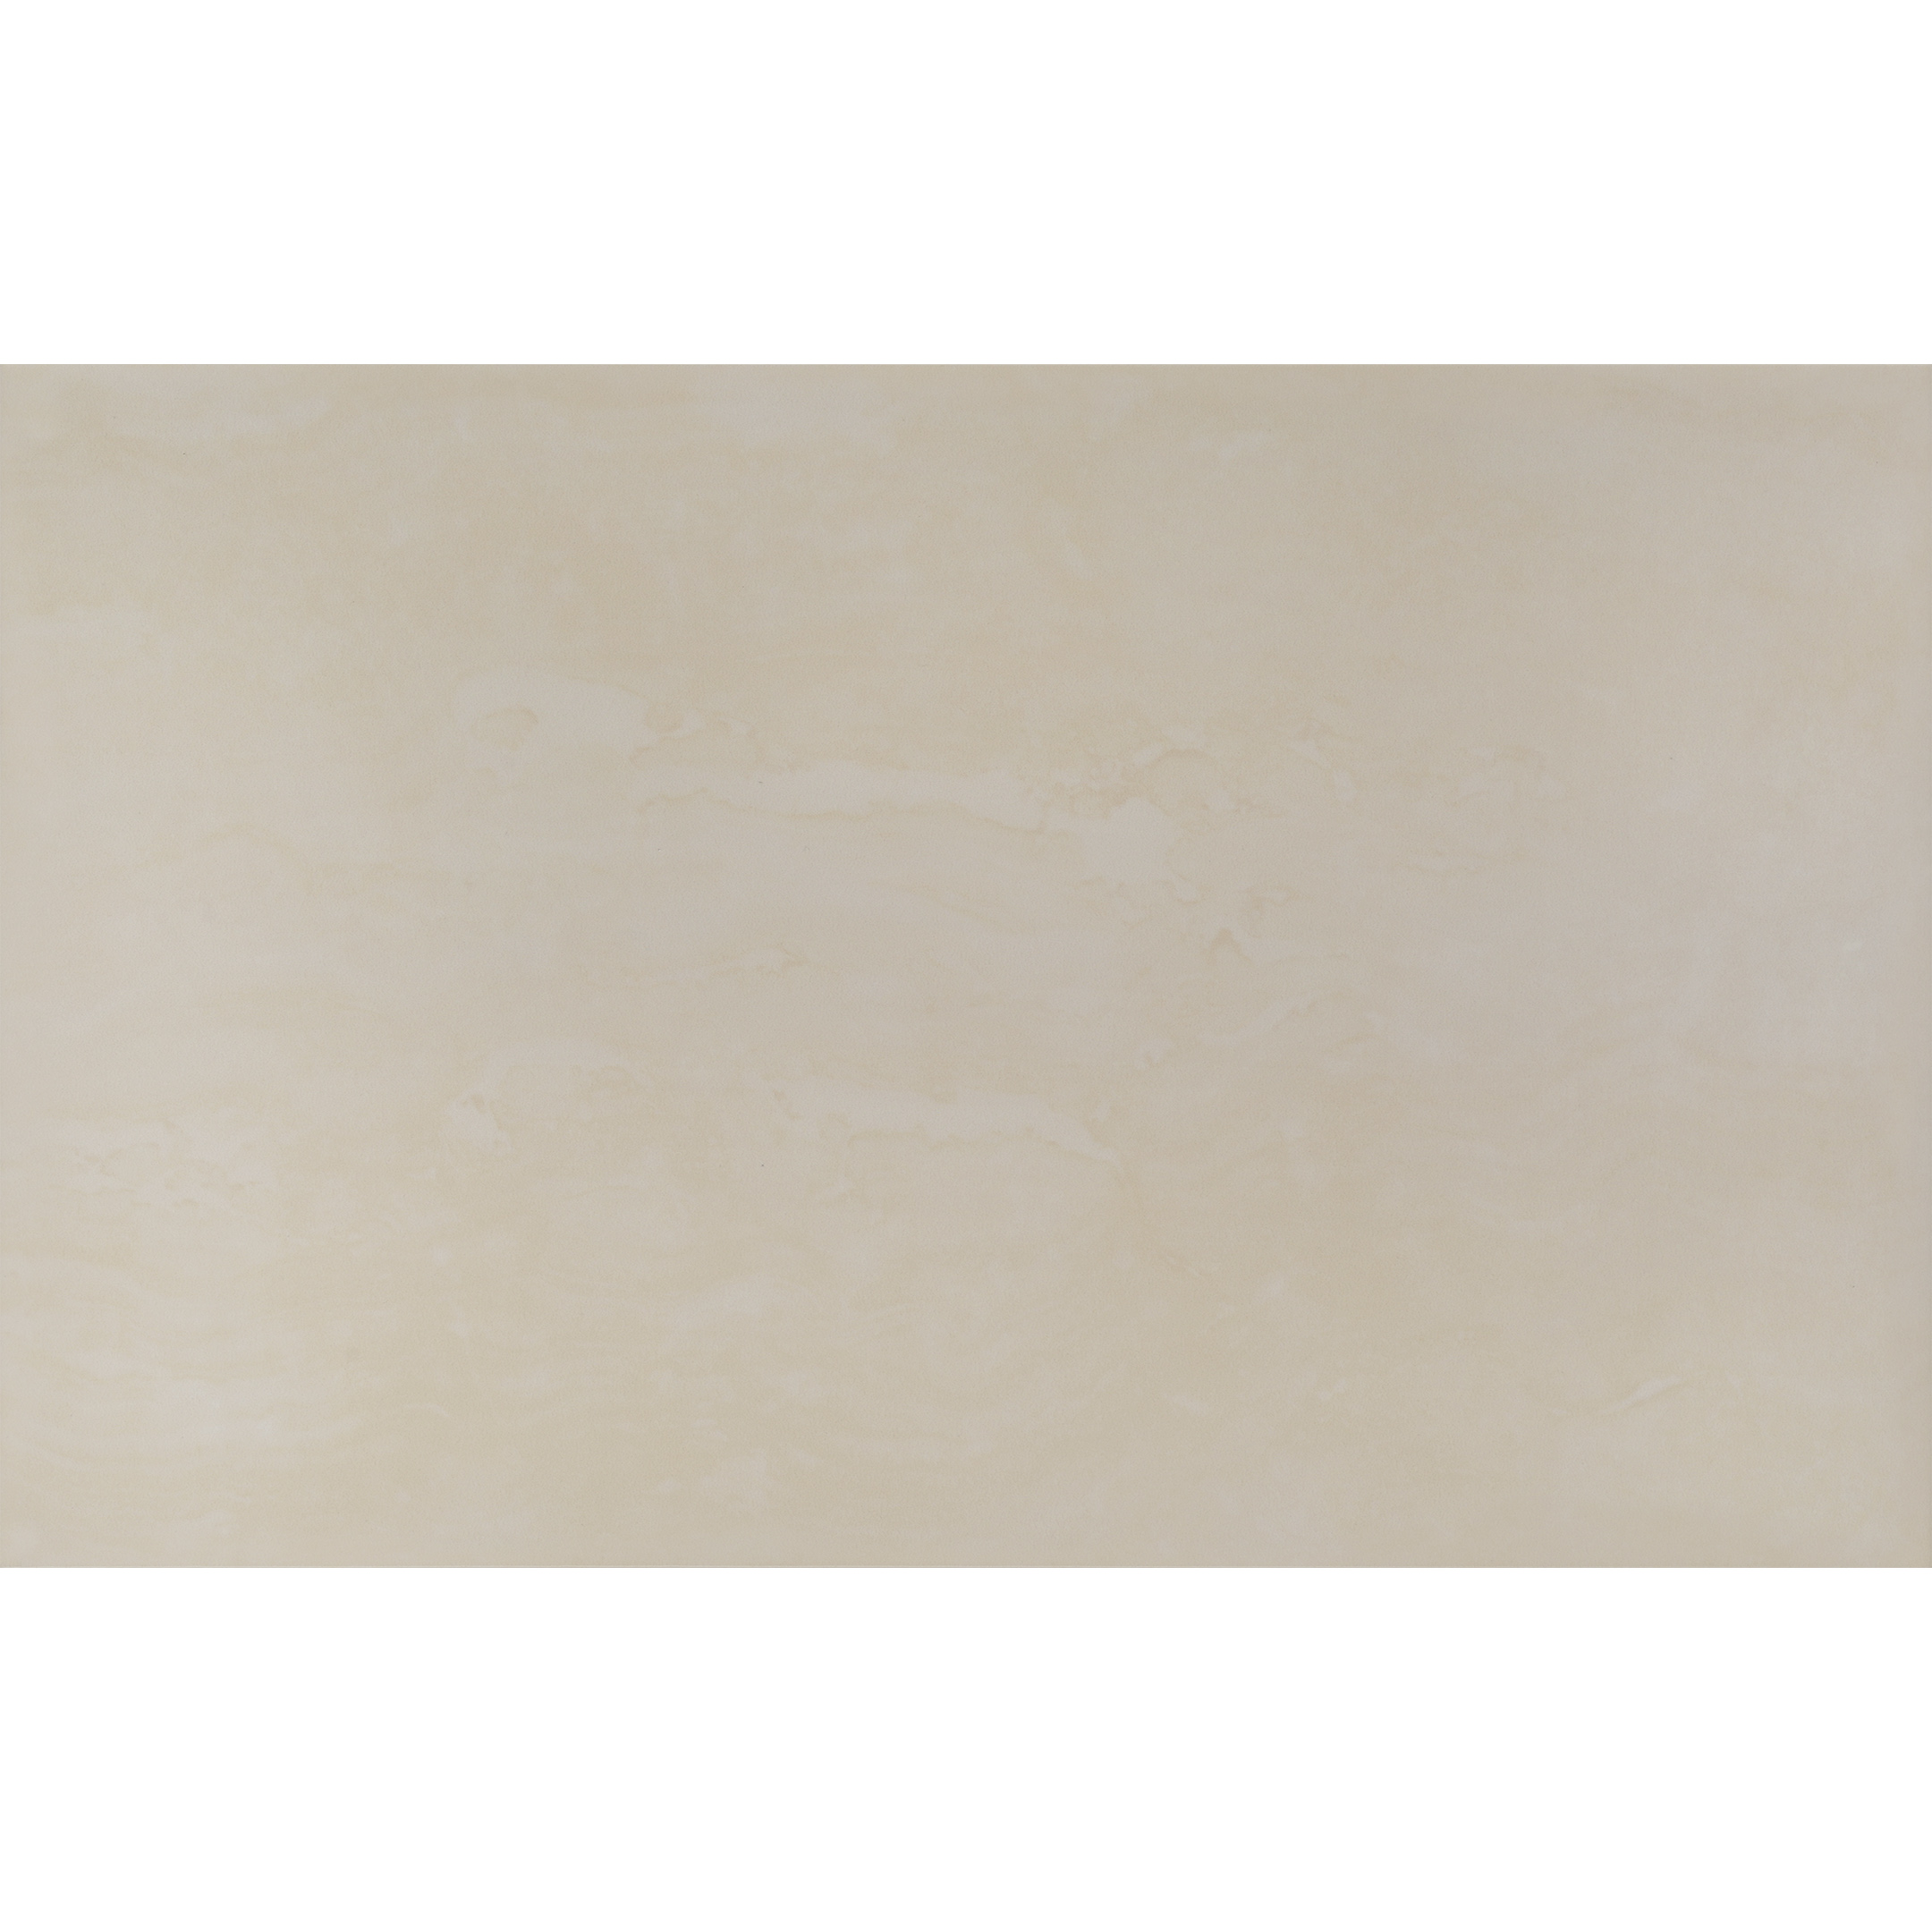 цена на Плитка облицовочная Unitile Арома светло-бежевый 250x400x8 мм (14 шт.=1,4 кв.м)